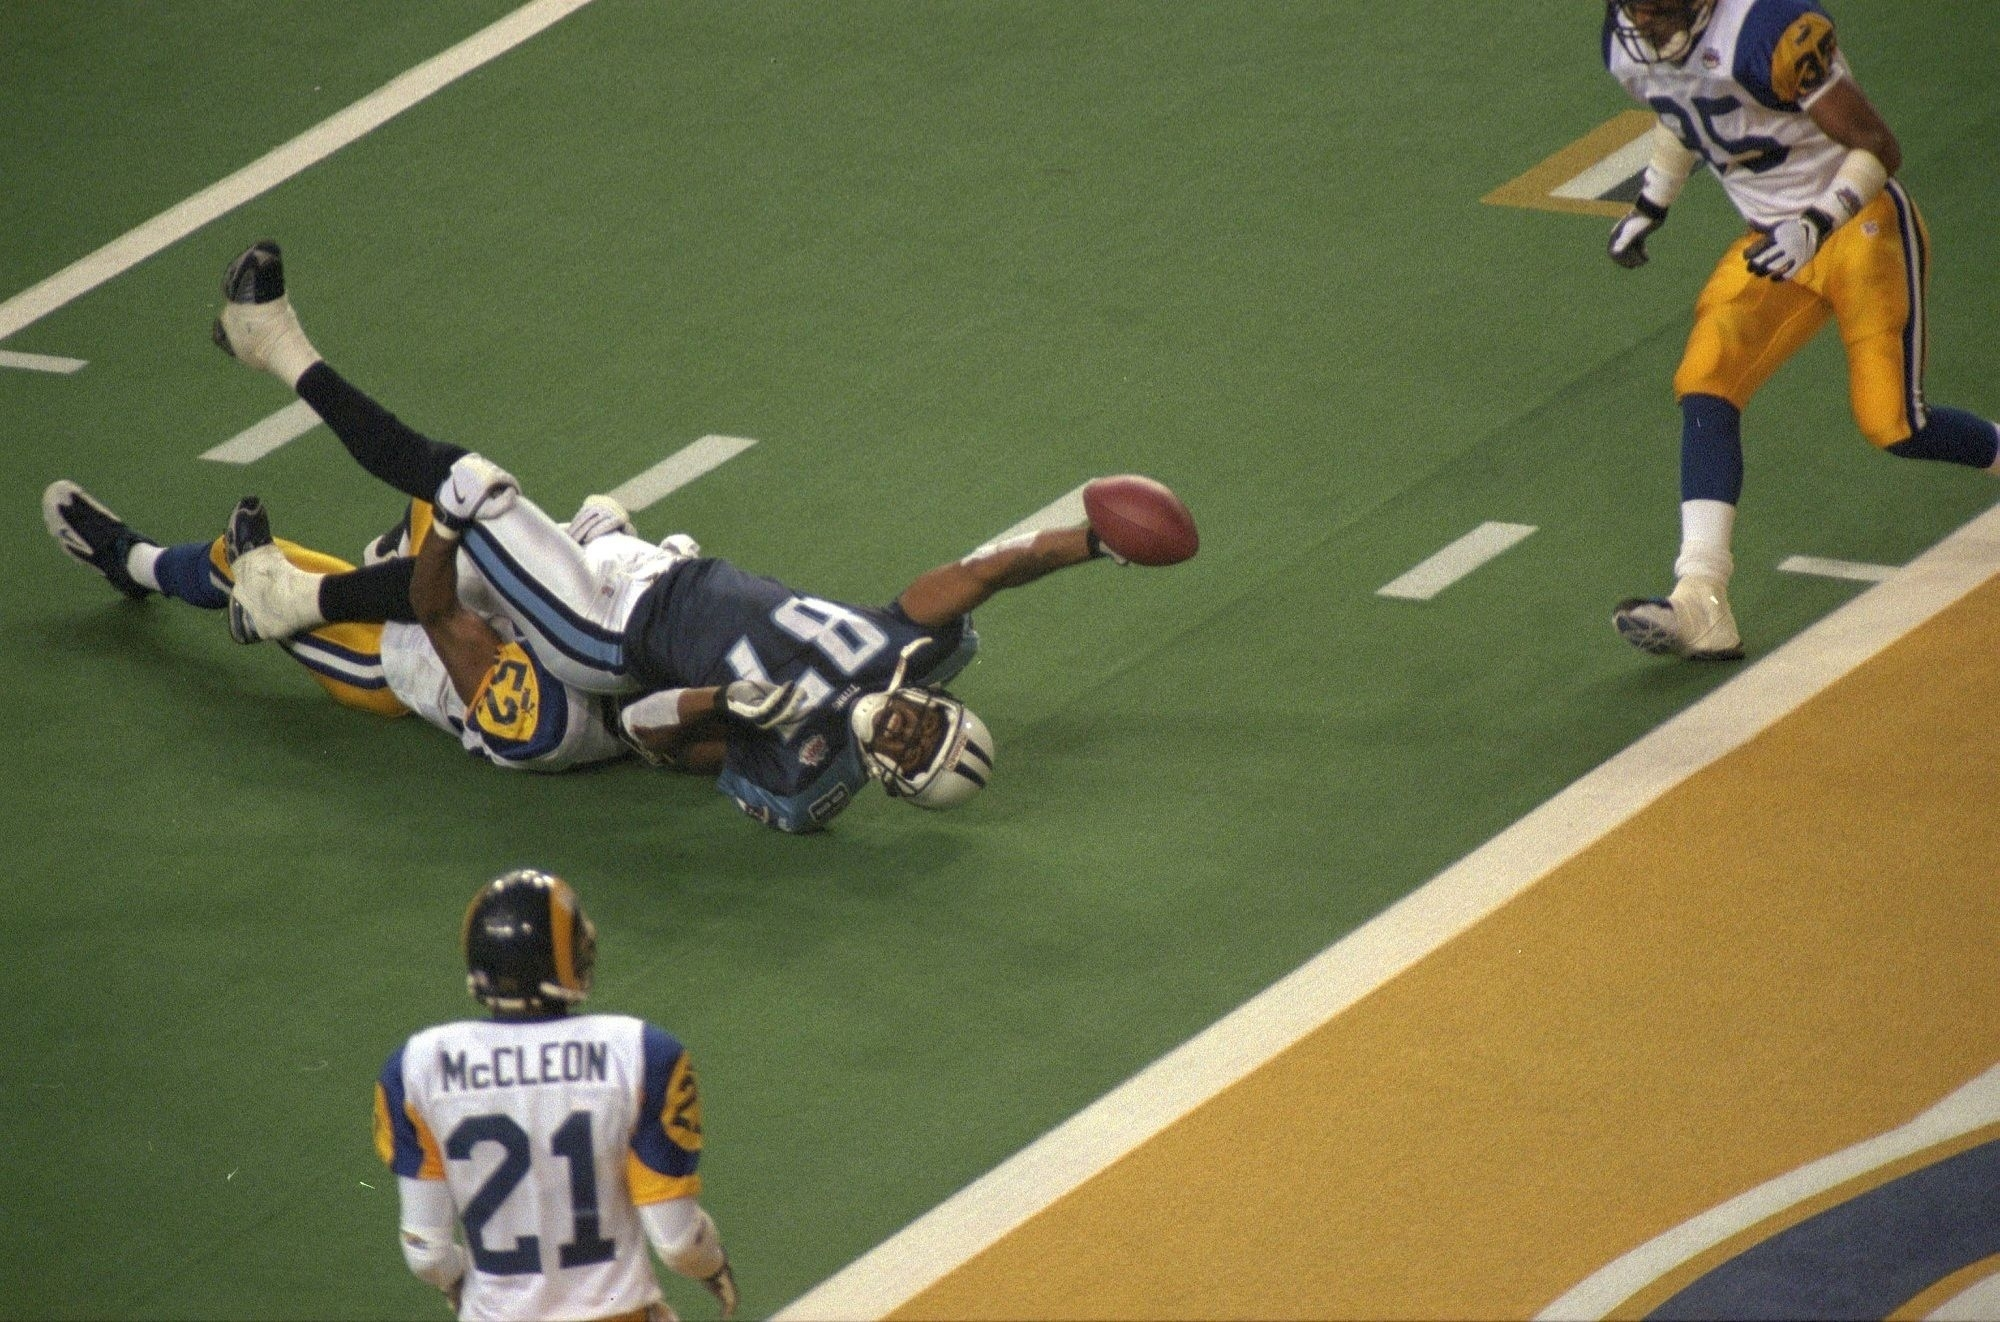 Super Bowl Xxxiv - St. Louis Rams D. Tennessee Titans, 23–16 intended for Tennessee Titans Super Bowl